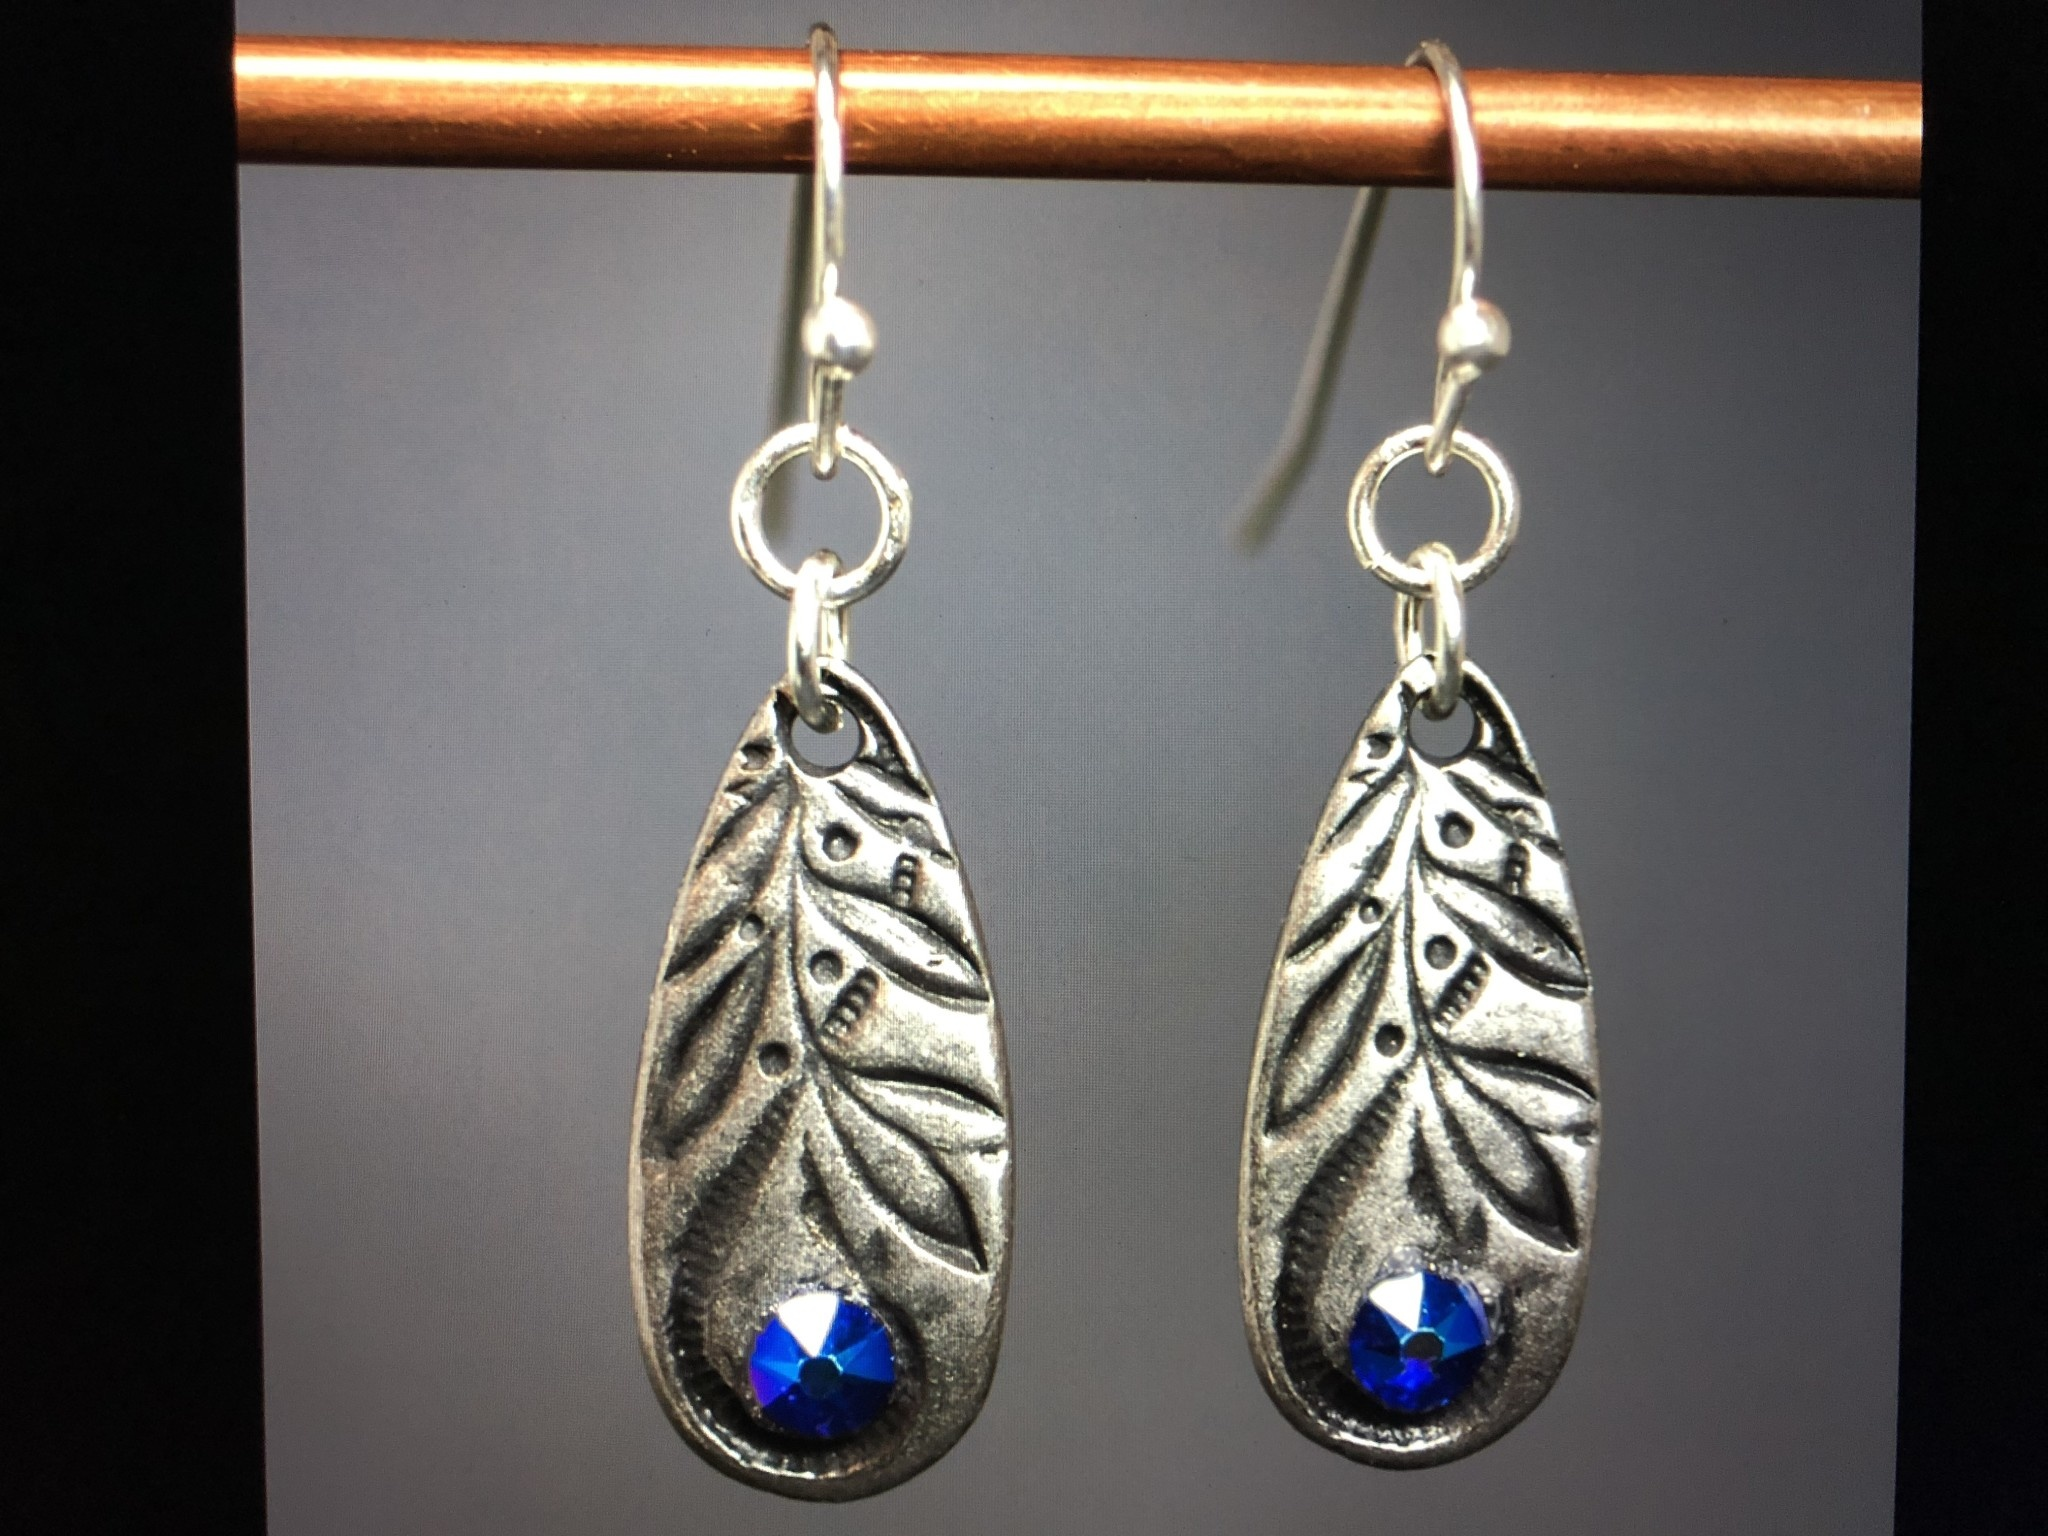 cool water jewelry EW550-69 Stamped Teardrop & Flatback Crystal